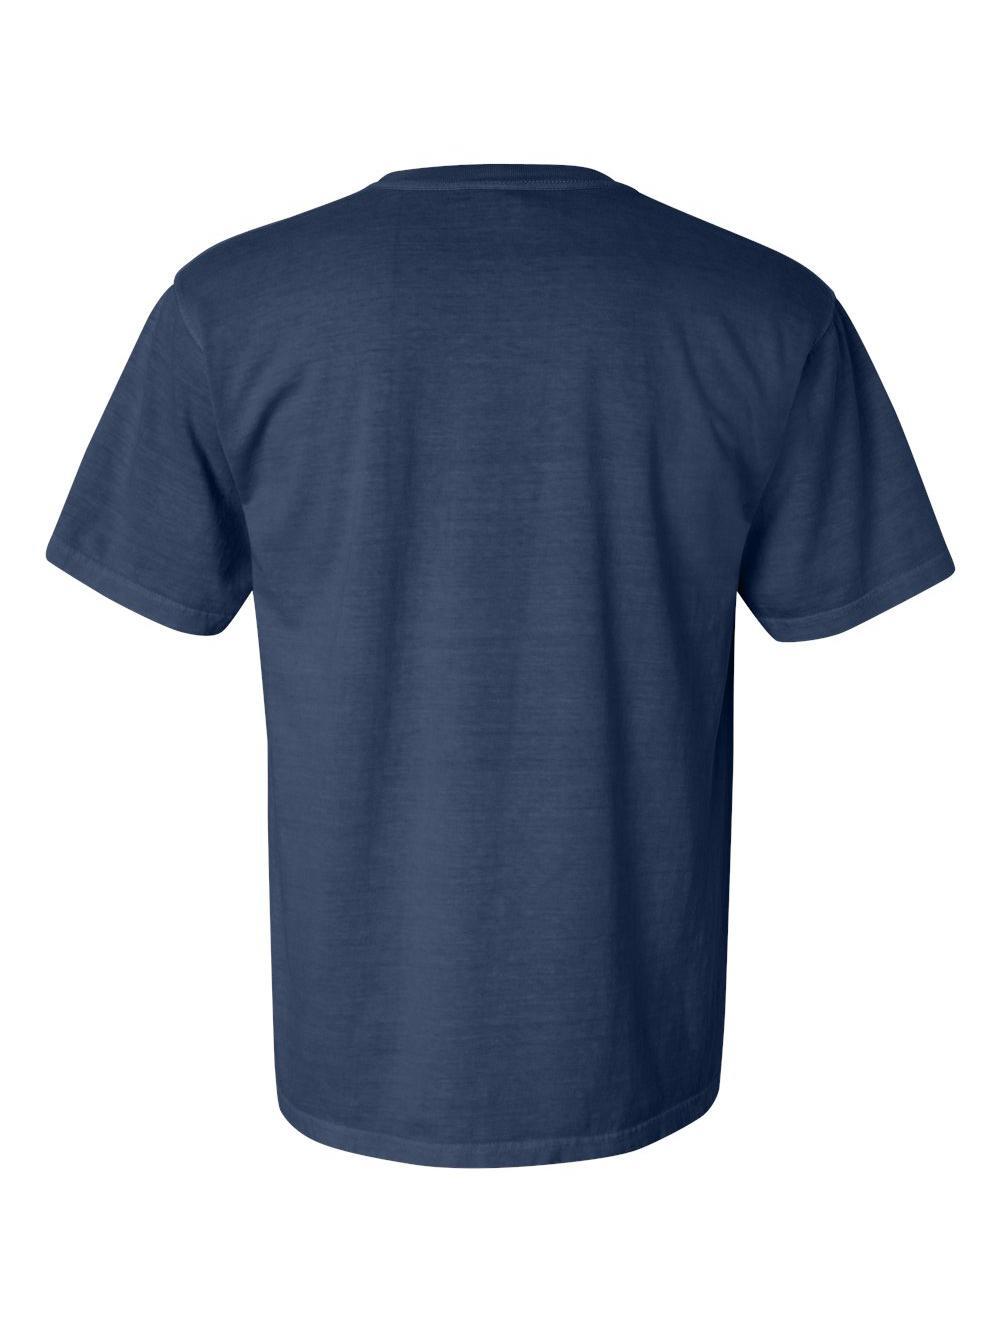 Comfort-Colors-Garment-Dyed-Heavyweight-Ringspun-Short-Sleeve-Shirt-1717 thumbnail 88